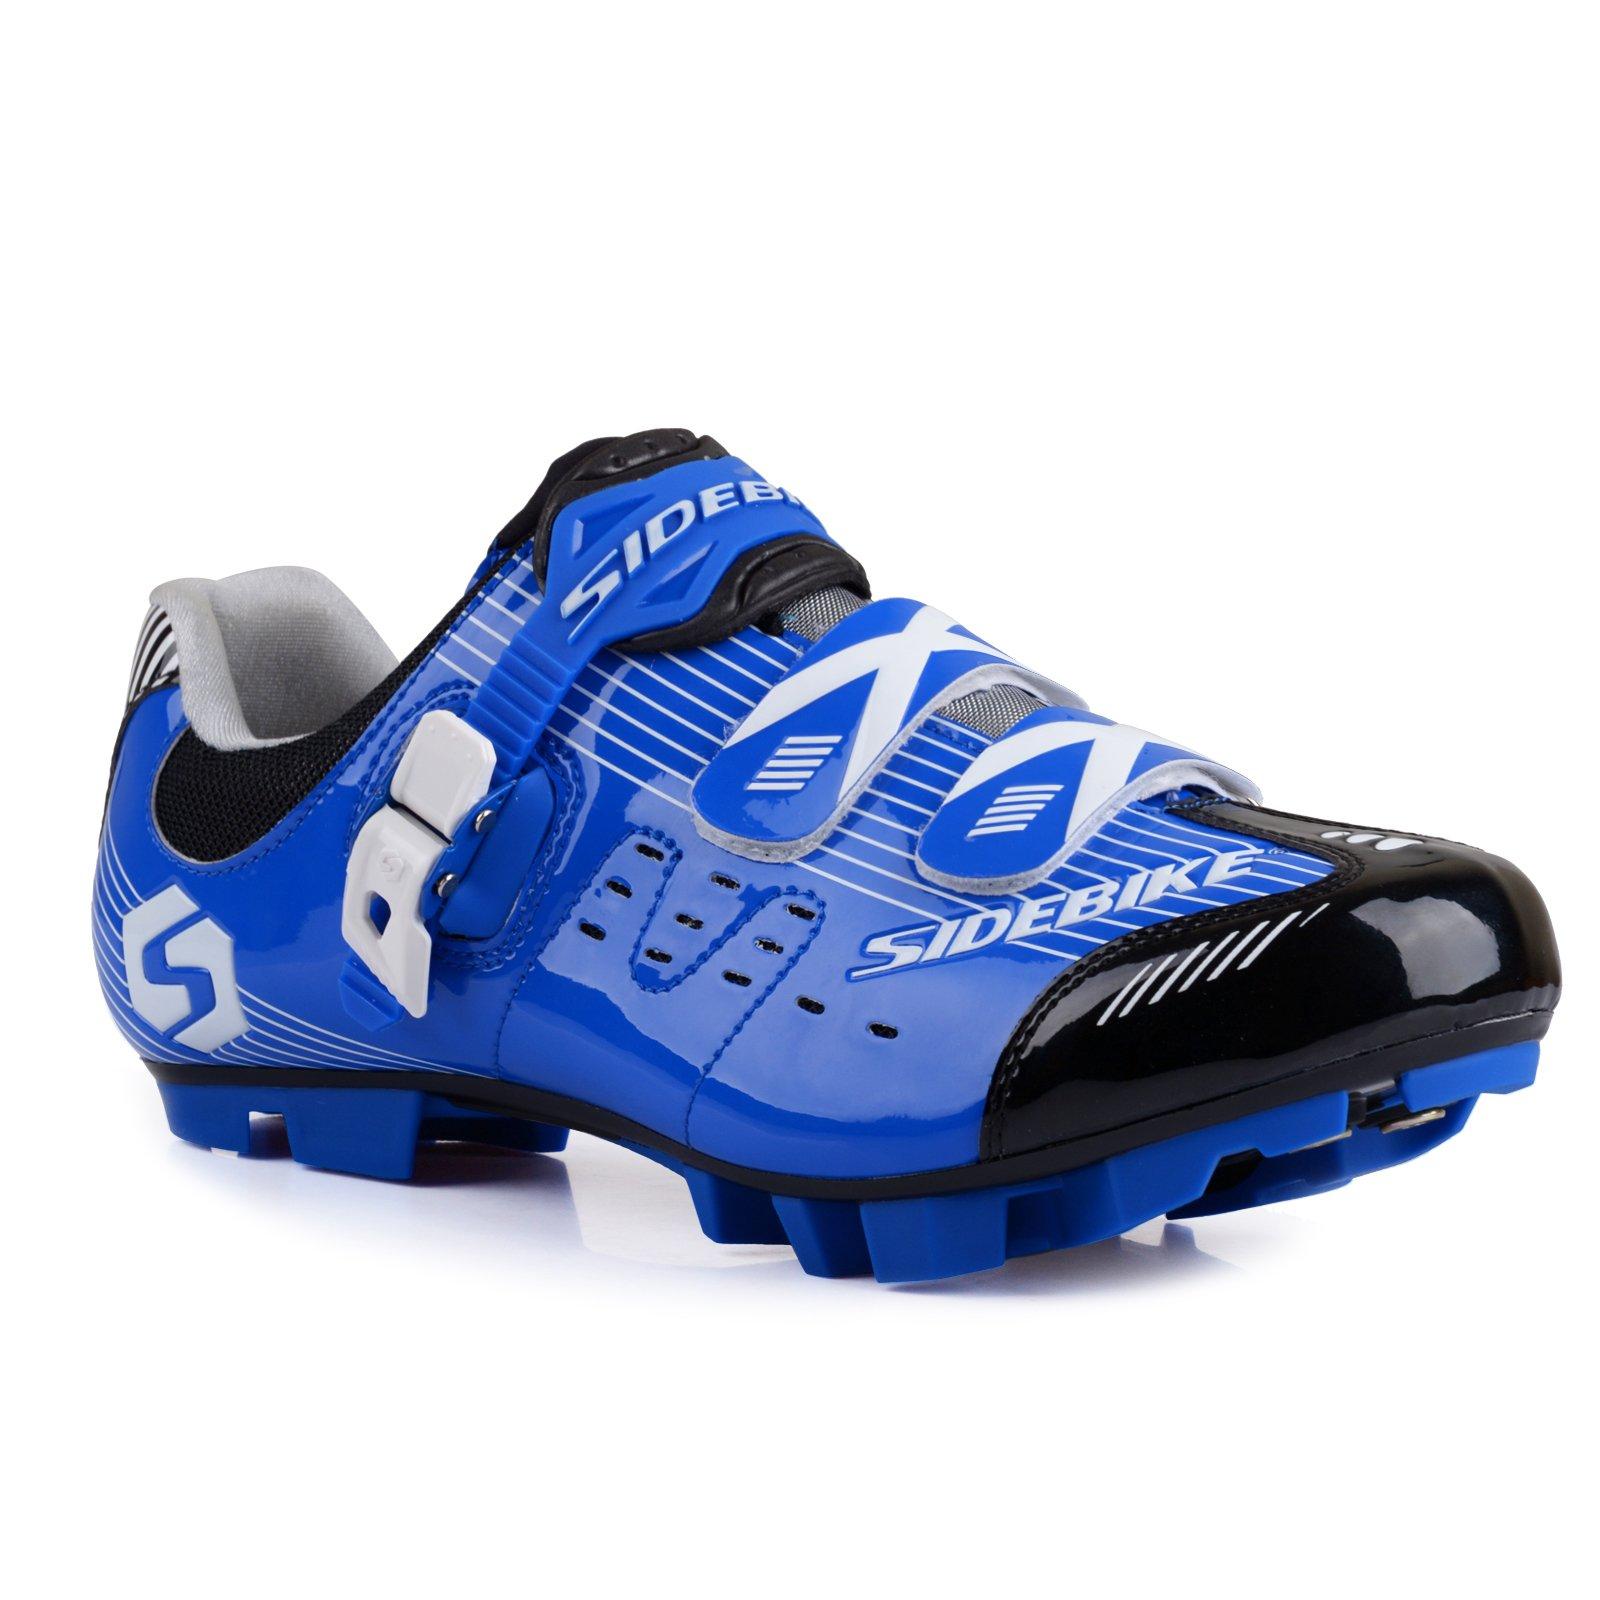 MTB Cycling Shoes Men Women (003-MTB Blue Black, US12/EU45/Ft28.5cm)